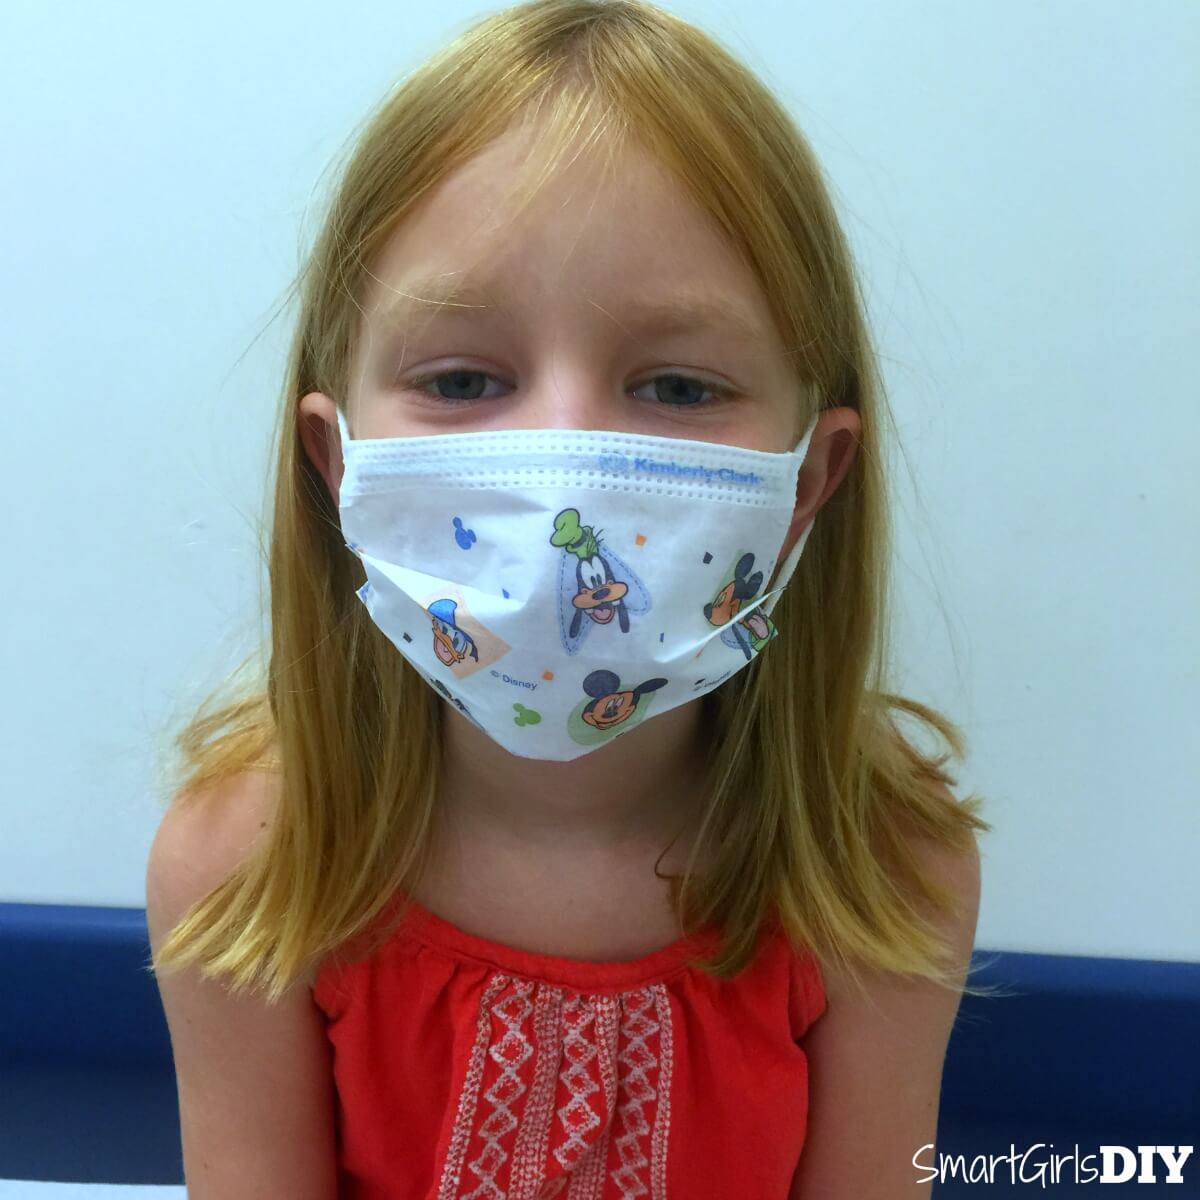 Poor baby has pneumonia